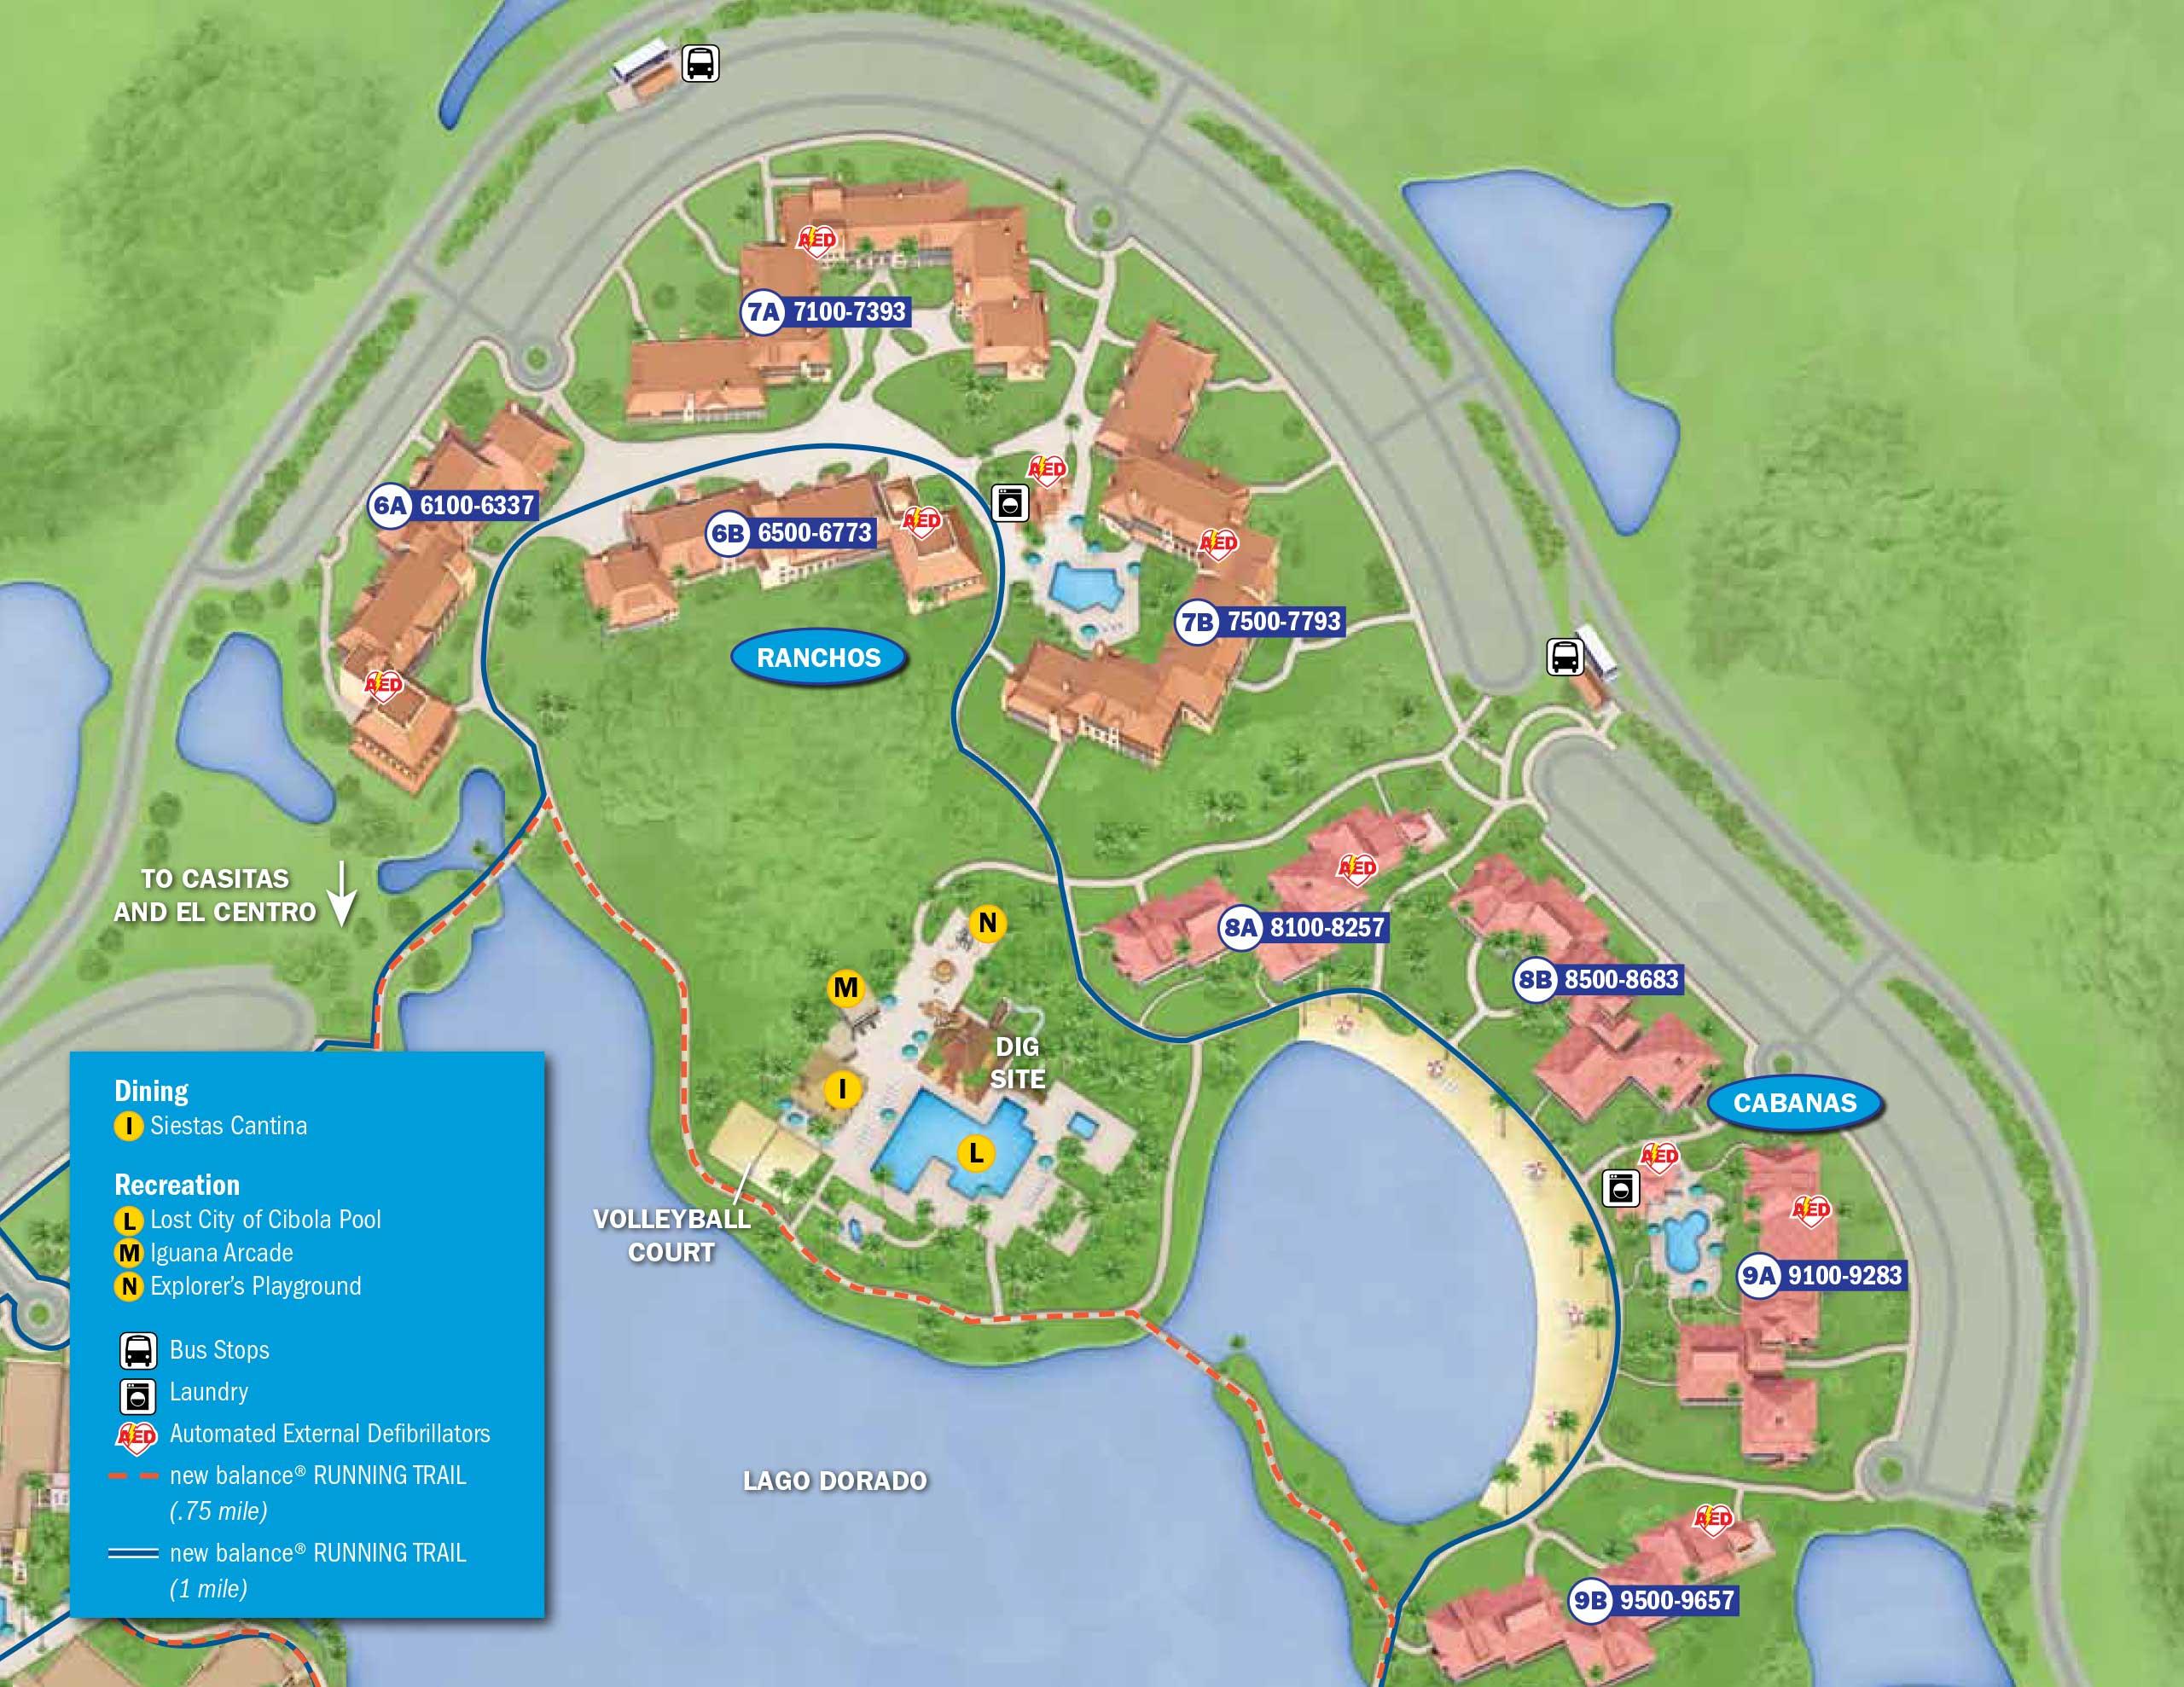 April 2017 Walt Disney World Resort Hotel Maps - Photo 12 of 33 on